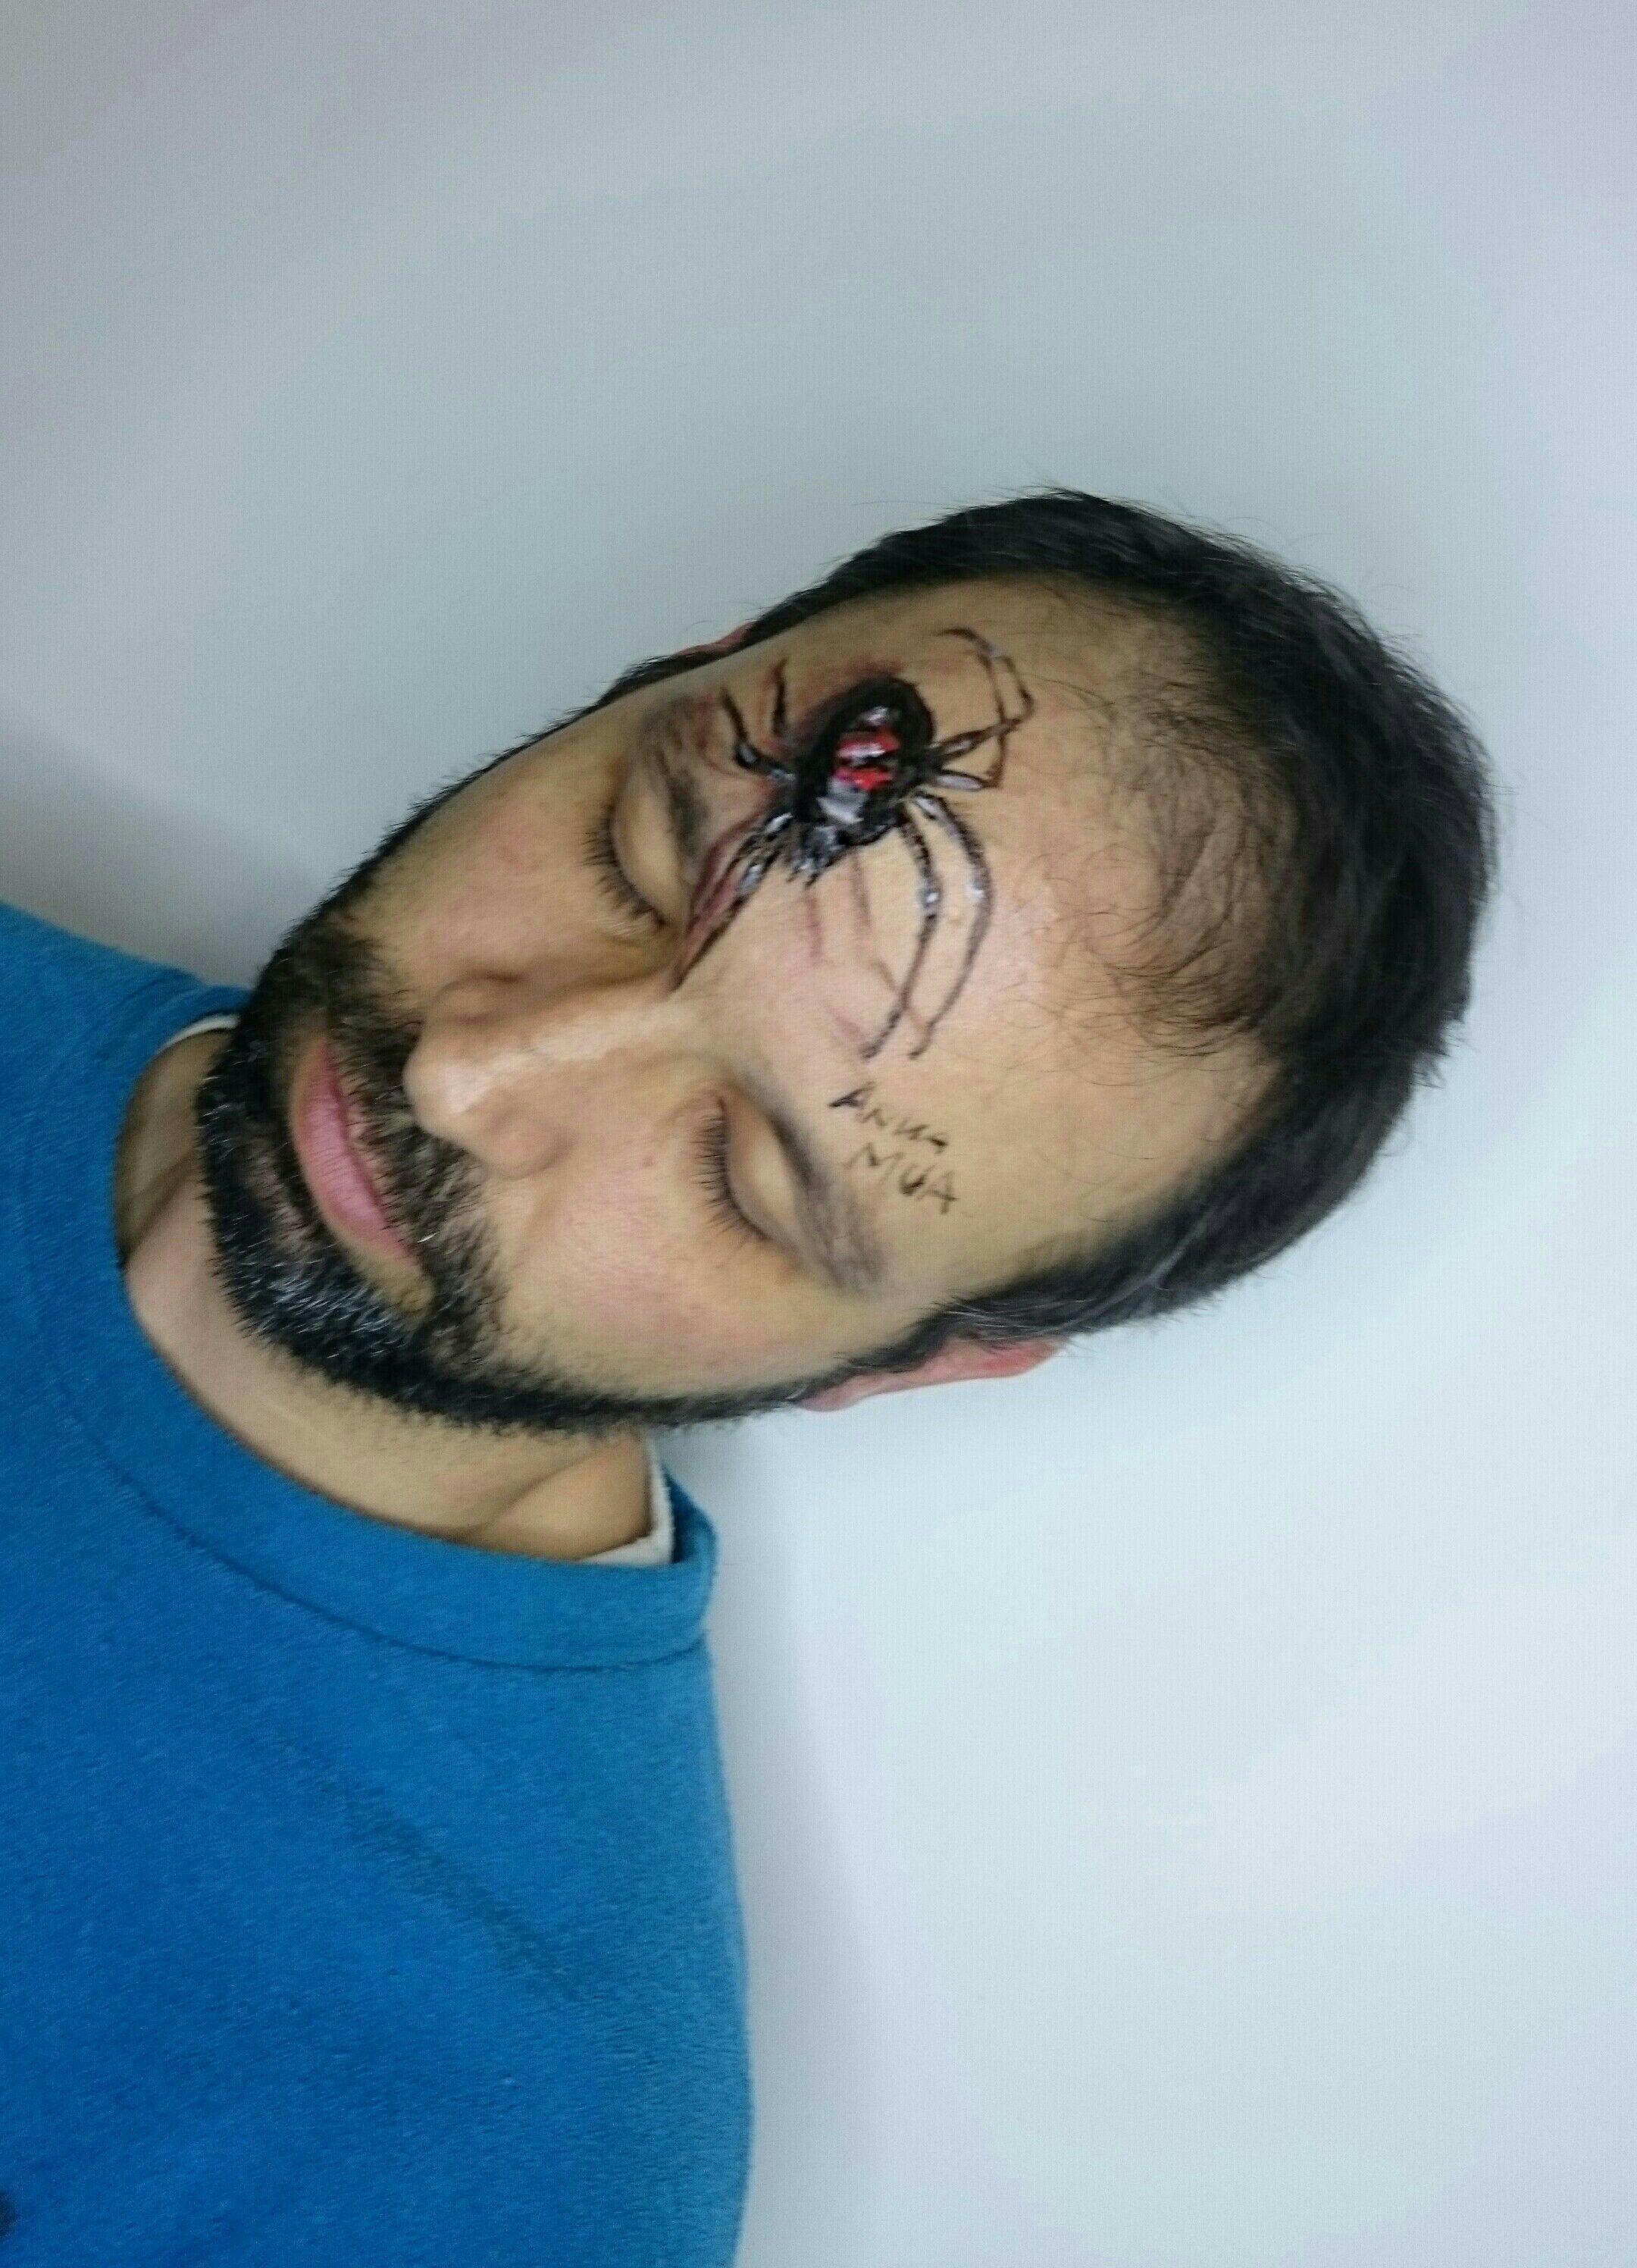 maquiagem maquiador(a) maquiador(a) maquiador(a)